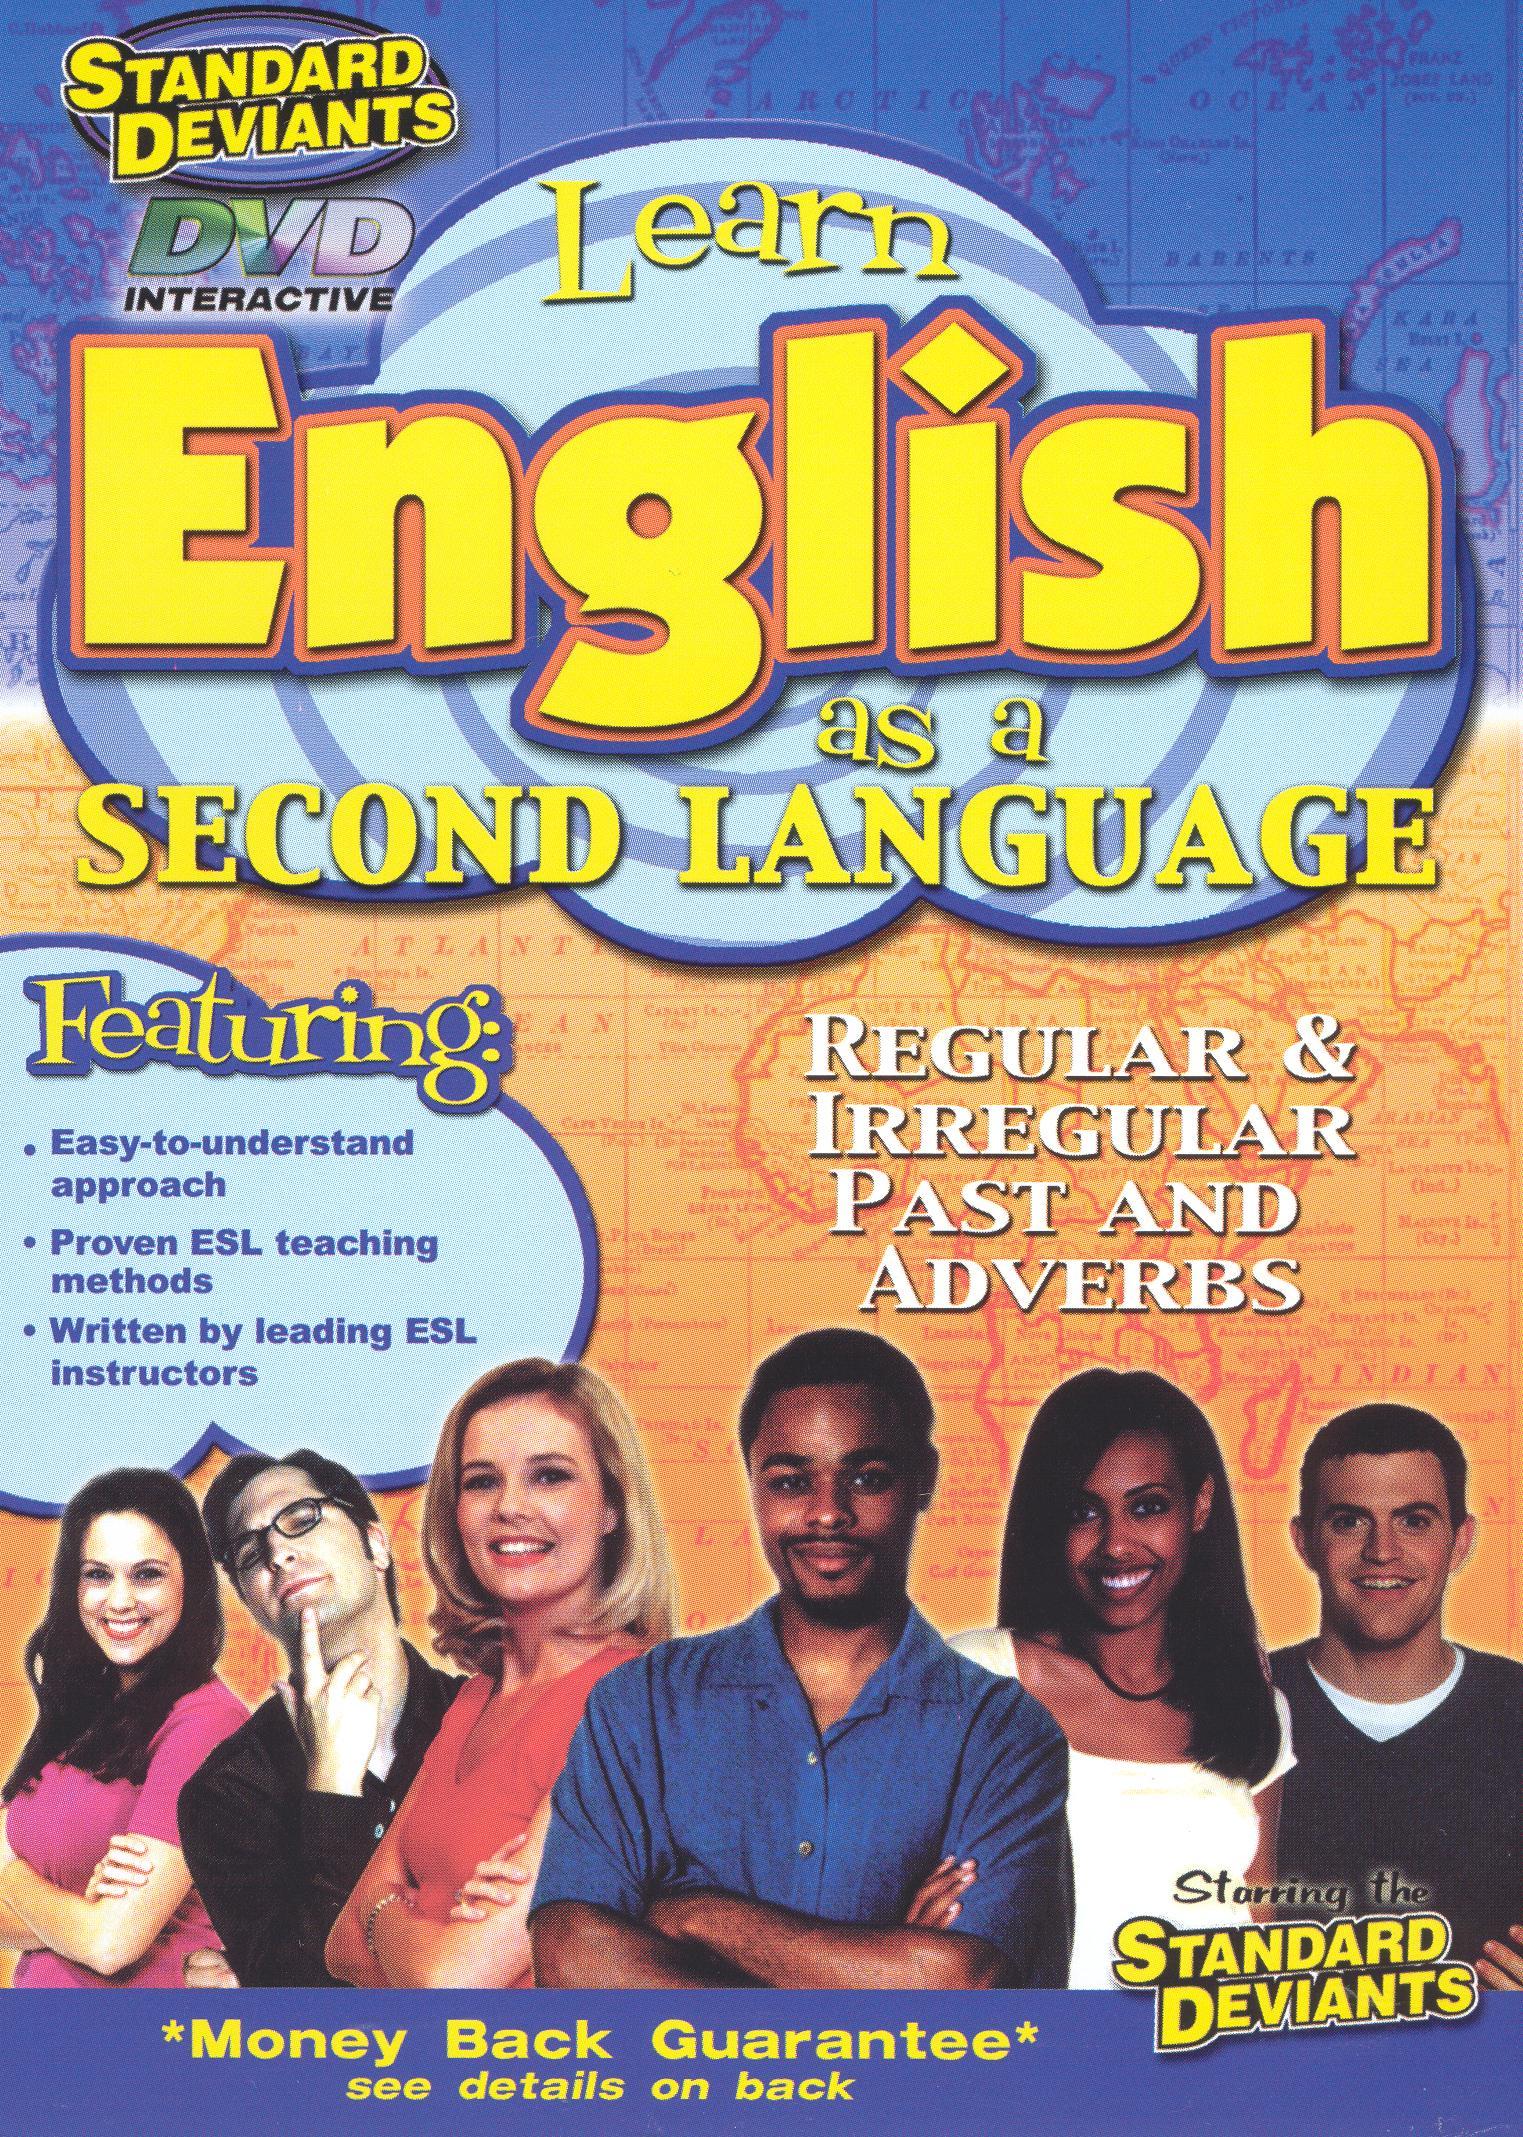 The Standard Deviants: ESL Program, Vol. 4 - Regular and Irregular Past and Adverbs